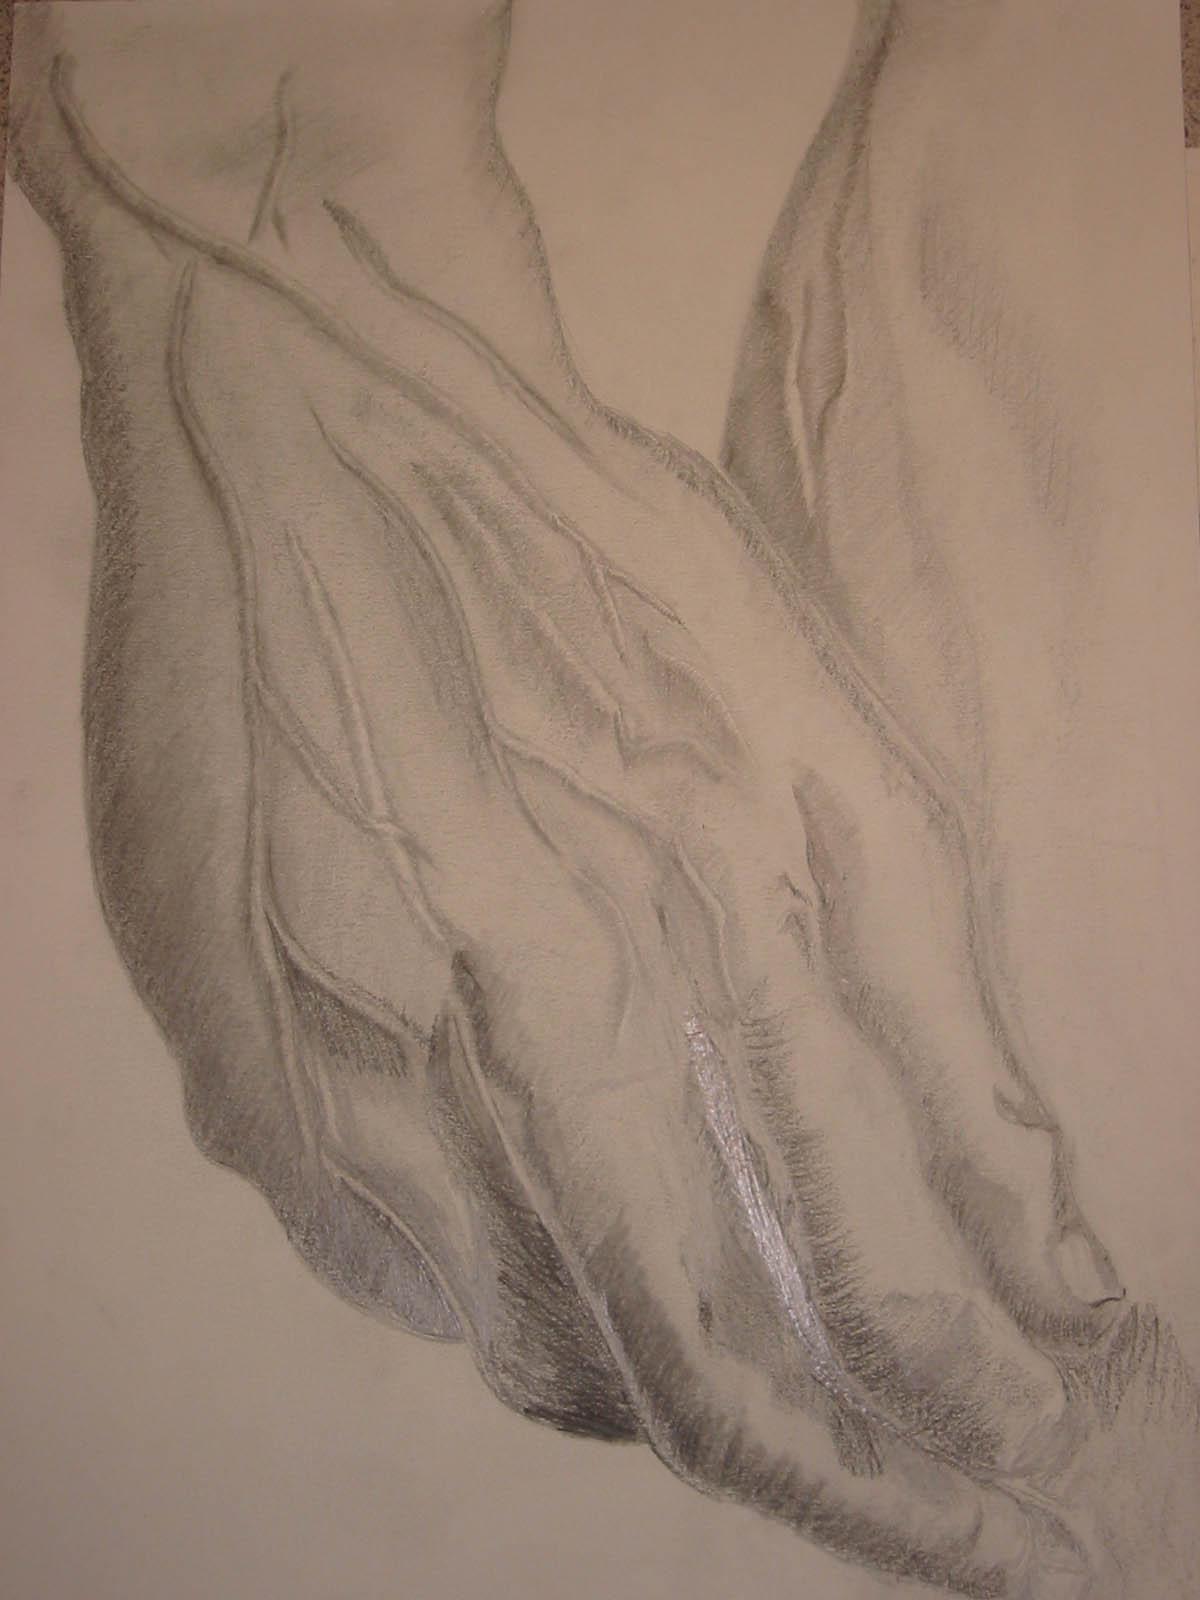 Mãos de Davi (Michelangelo)